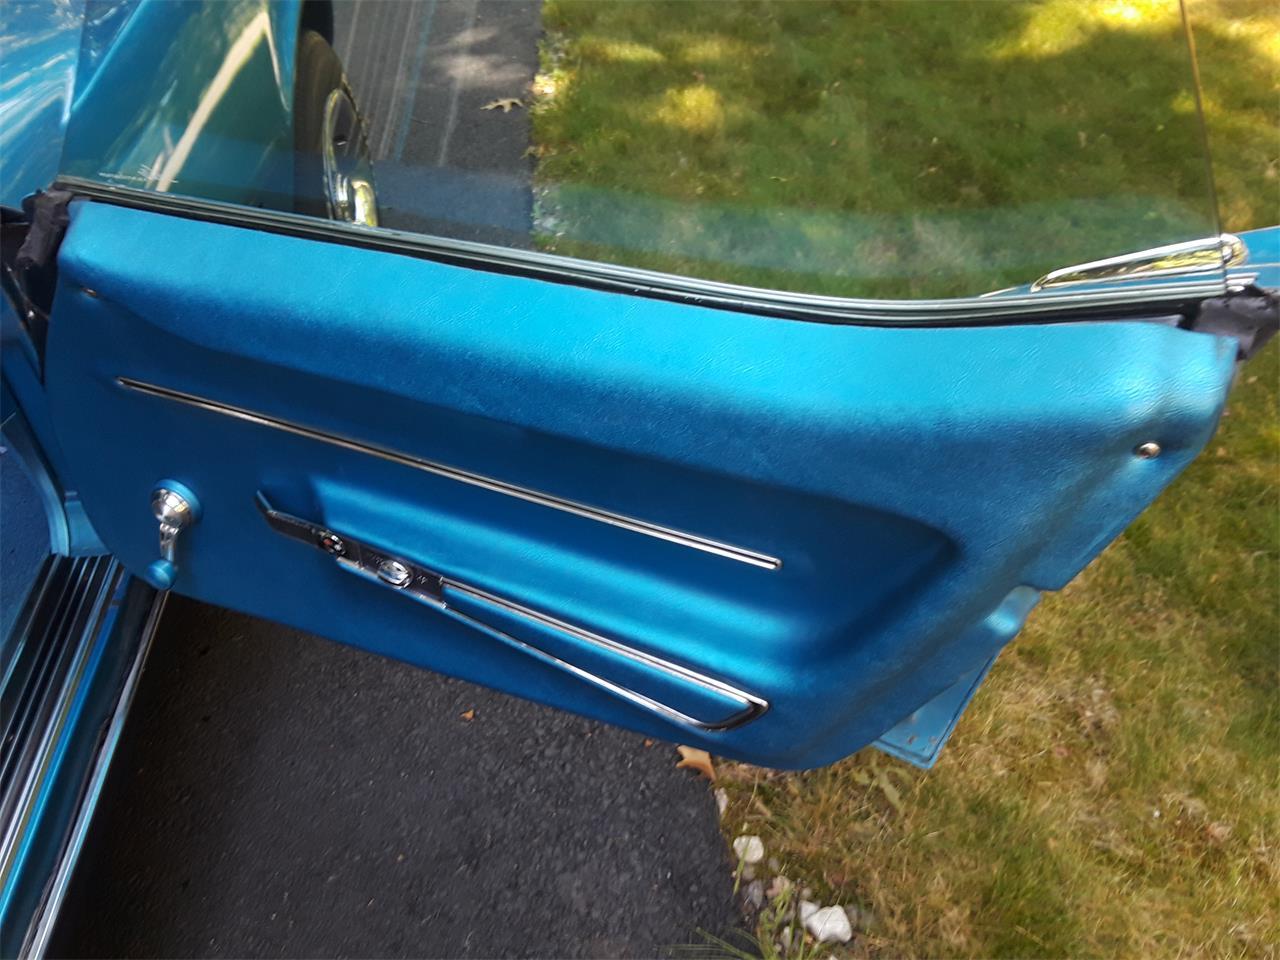 1968 Chevrolet Corvette (CC-1336286) for sale in Milford, Pennsylvania